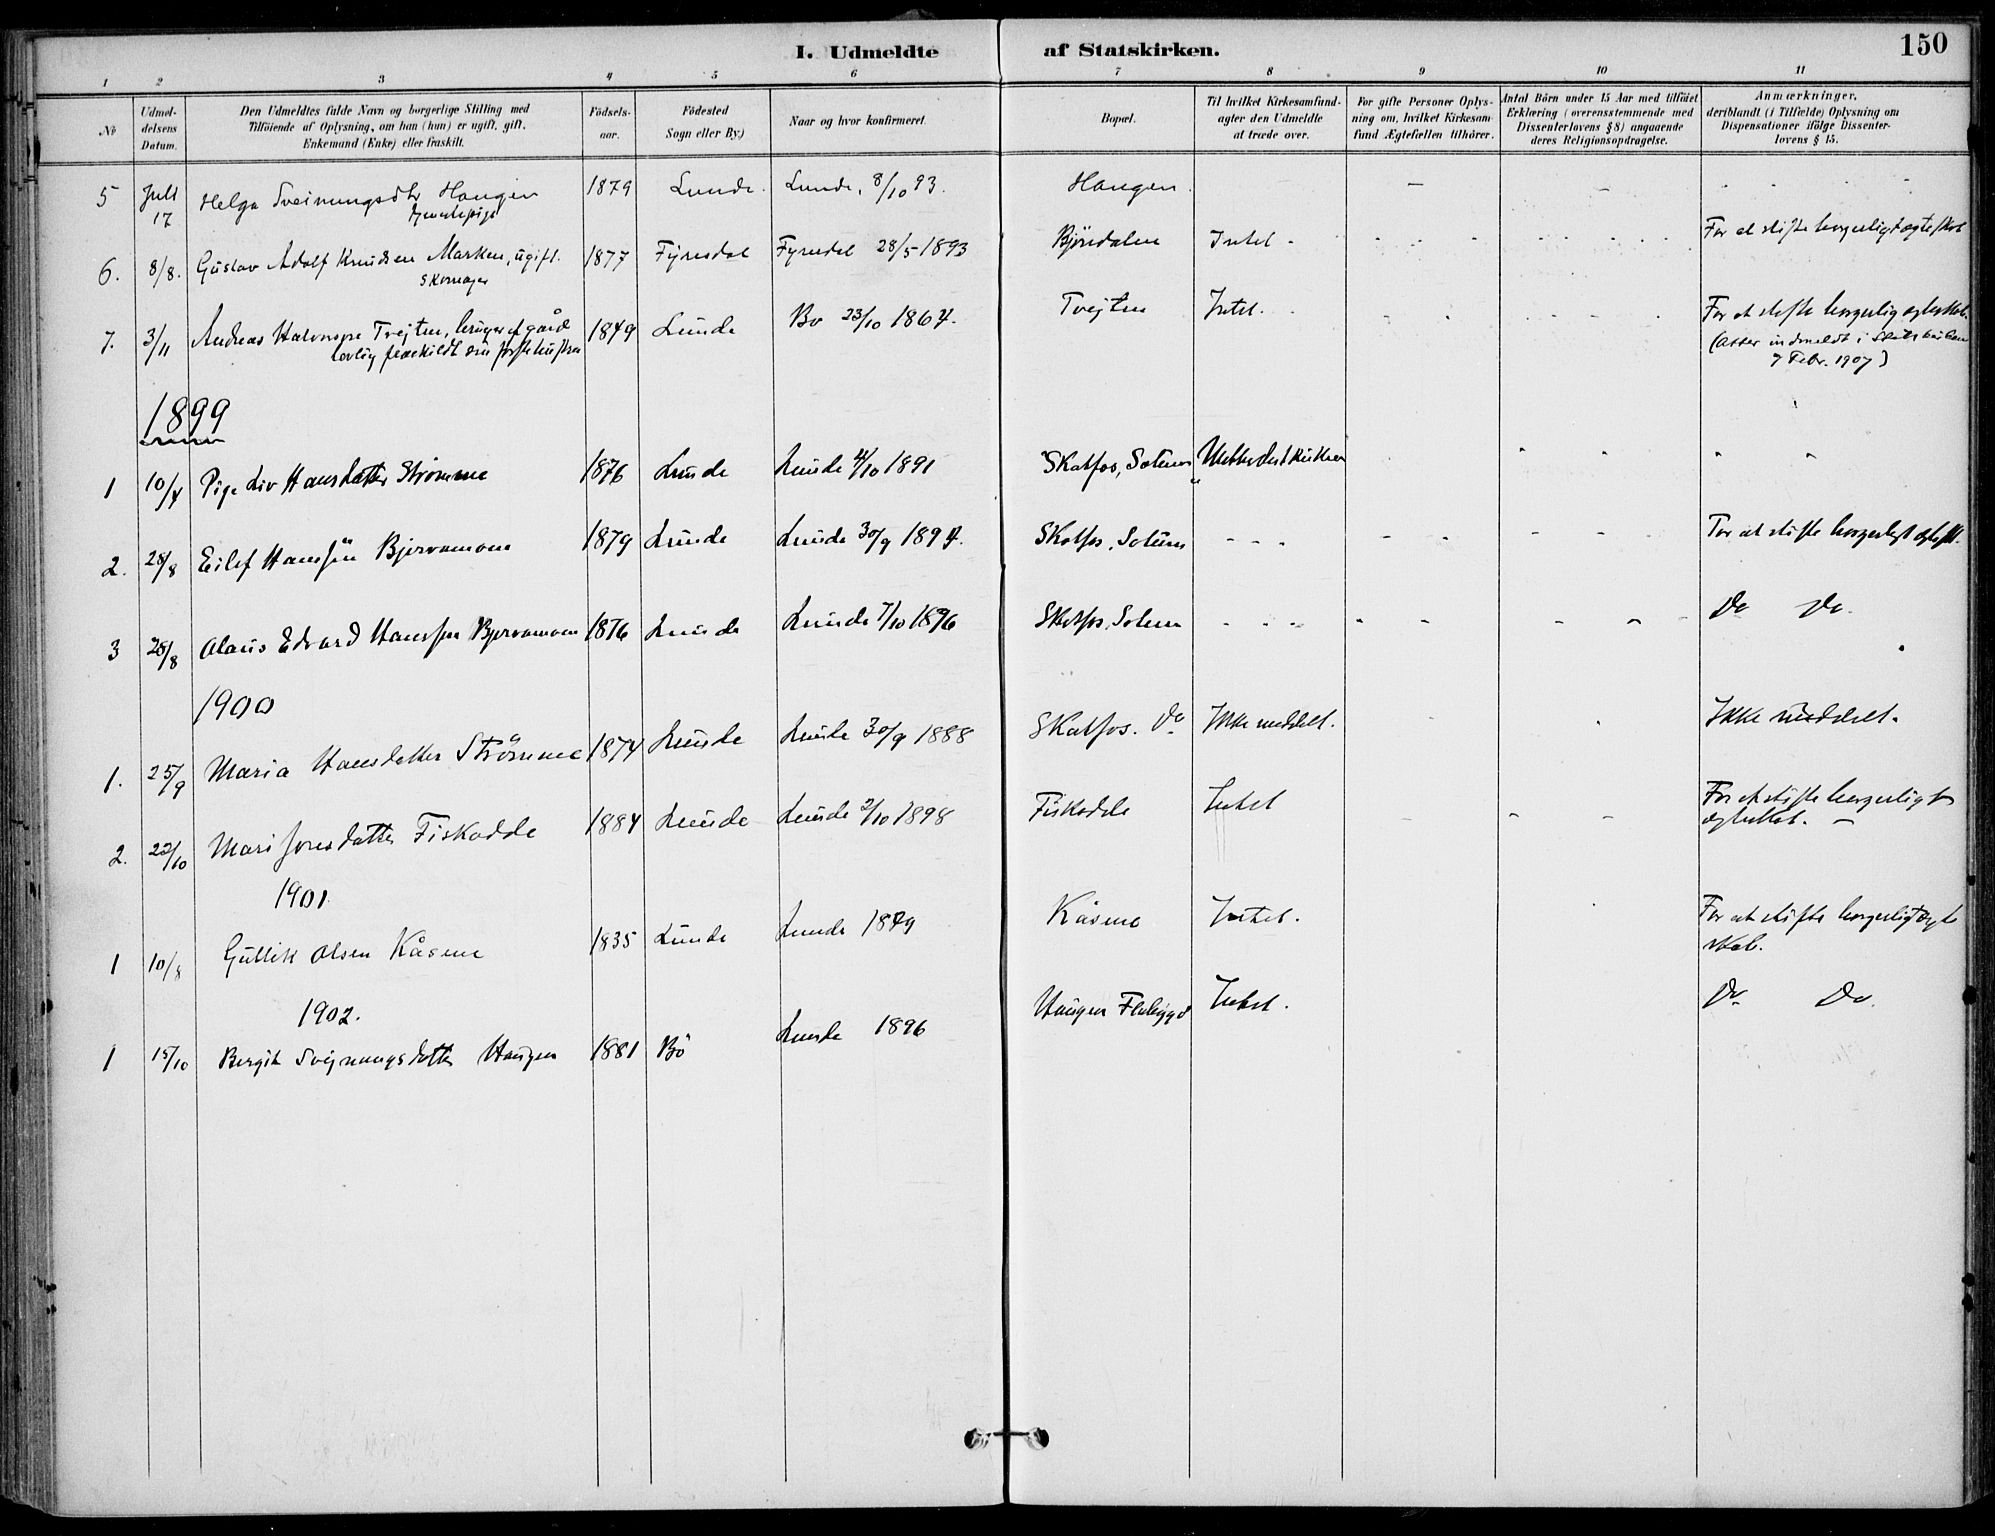 SAKO, Lunde kirkebøker, F/Fa/L0003: Ministerialbok nr. I 3, 1893-1902, s. 150